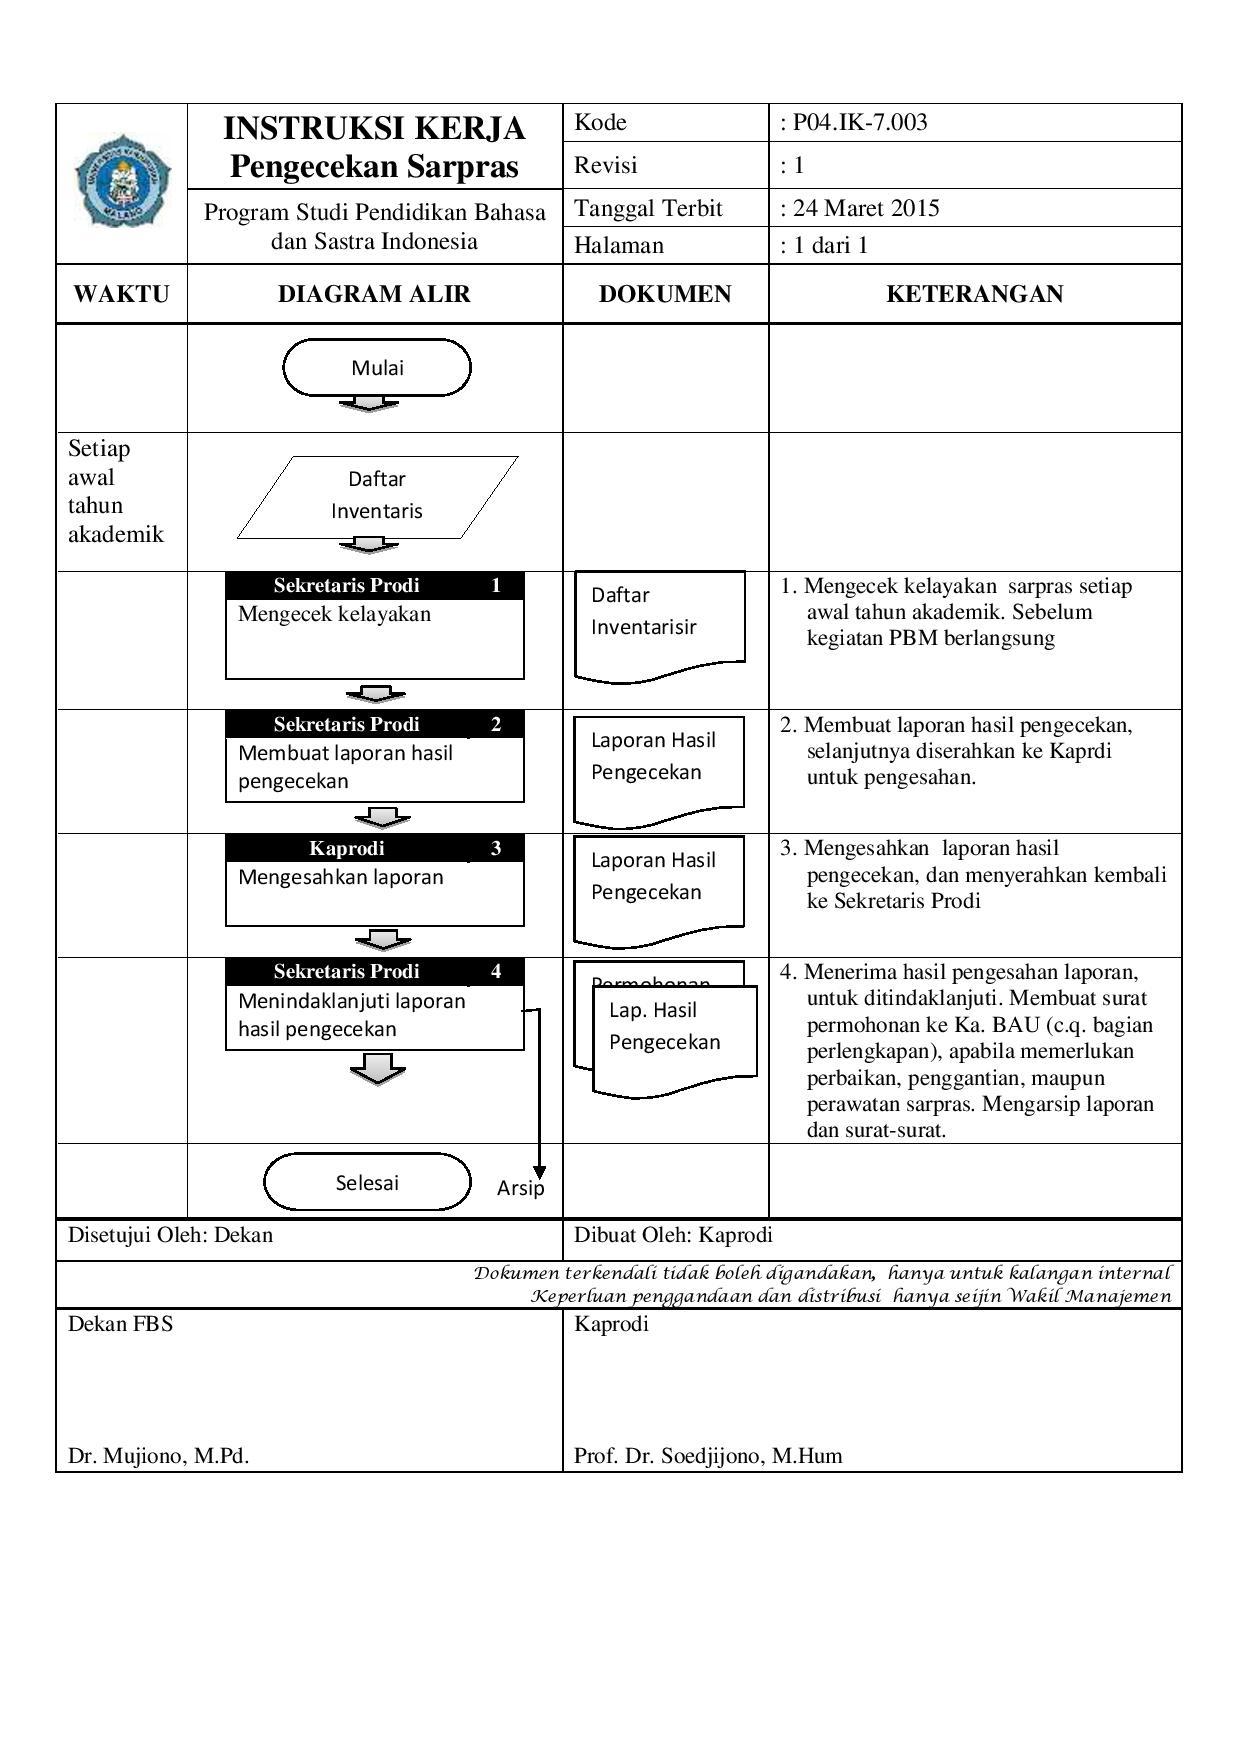 INSTRUKSI KERJA PENGECEKAN SARPRAS (1)(2)-page-001